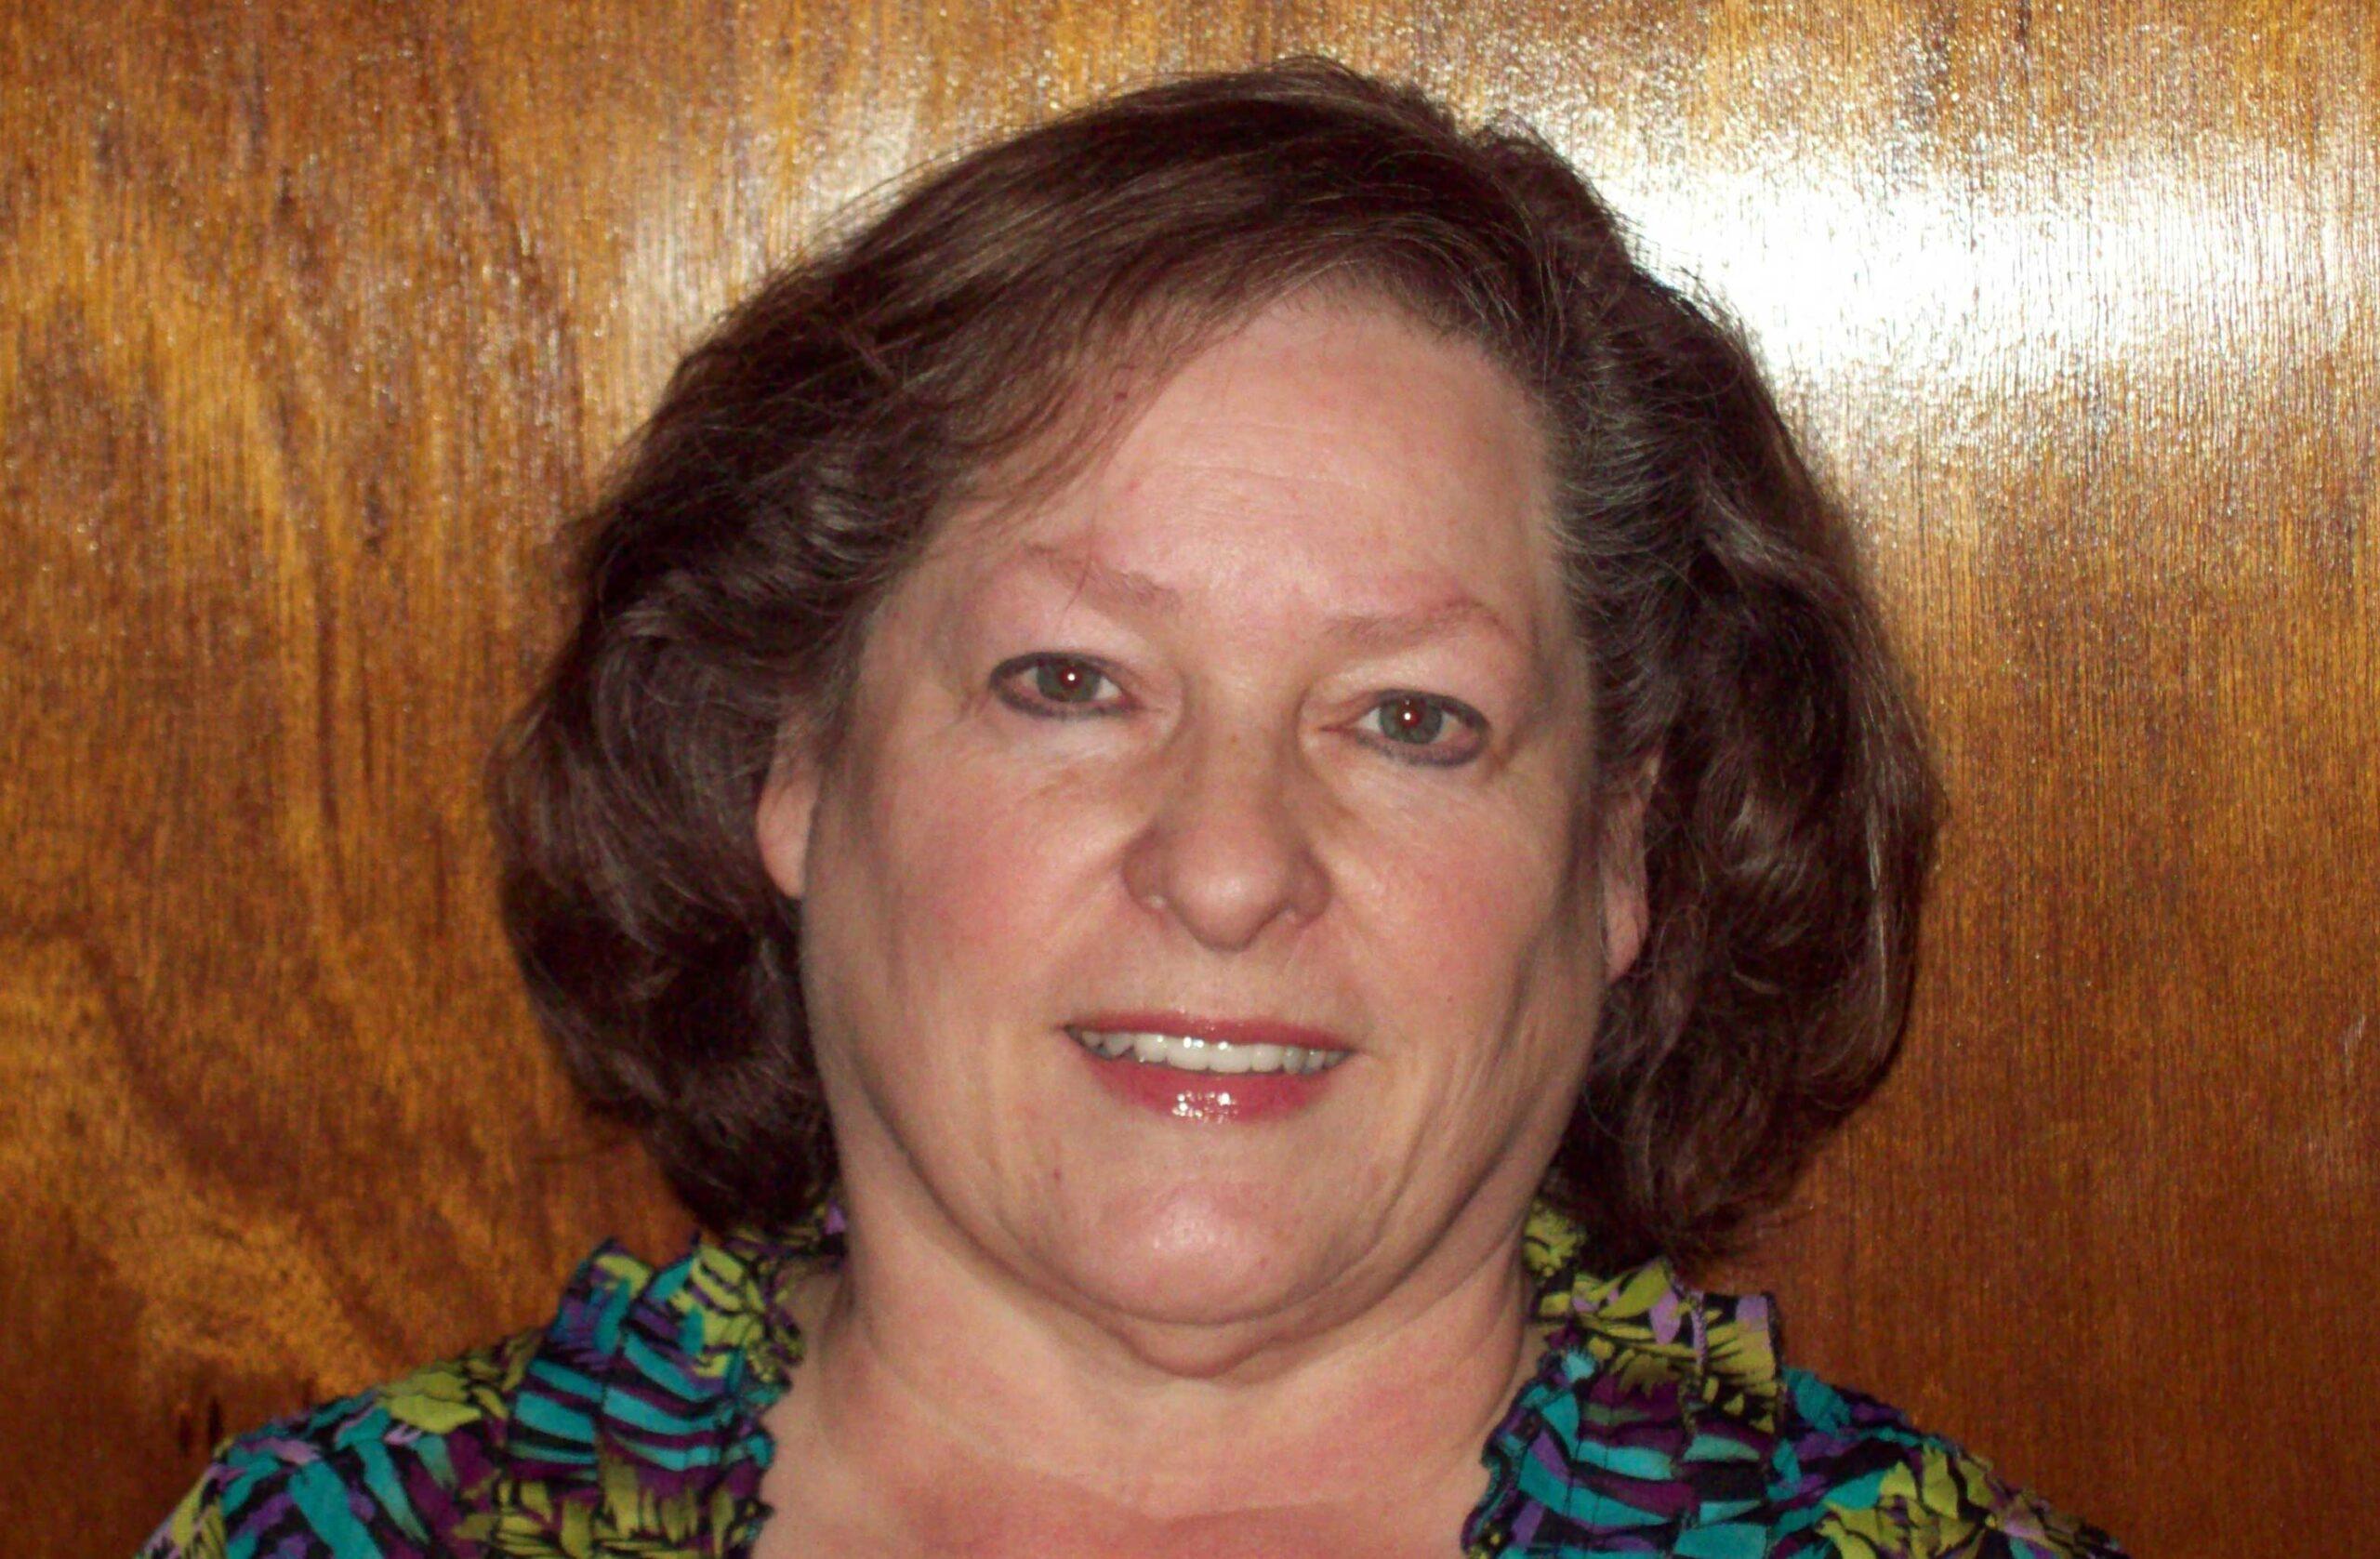 Furry Friends Spotlight on Malinda Goldbeck